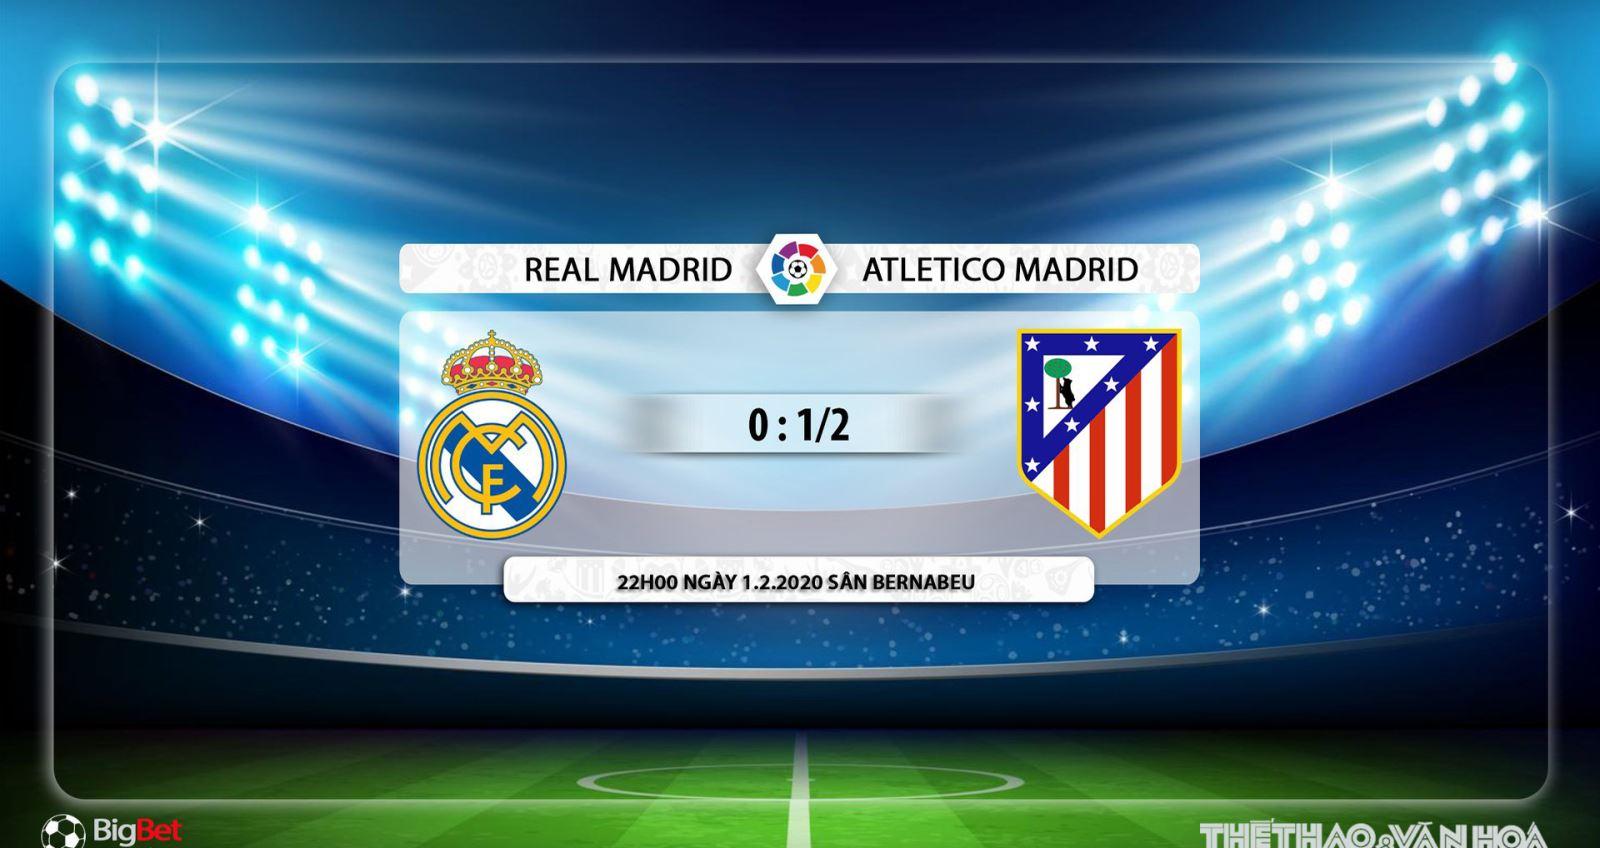 dự đoán Real Madrid vs Atletico Madrid, trực tiếp Real Madrid vs Atletico Madrid, nhận định Real Madrid vs Atletico Madrid, Real Madrid, Atleico Madrid, K+, K+PM